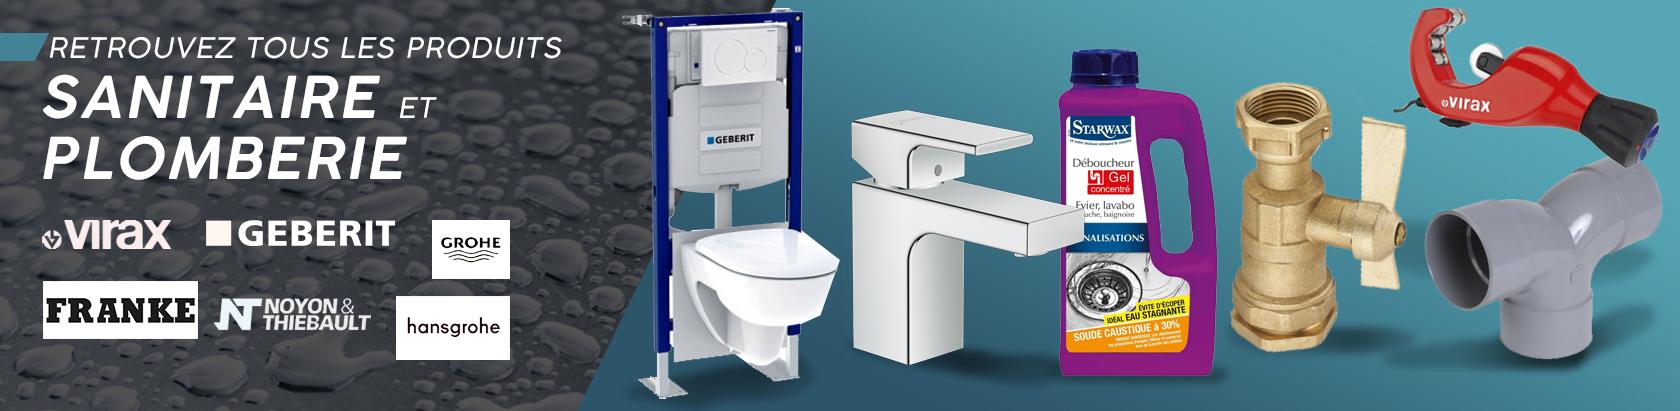 Sanitaire plomberie